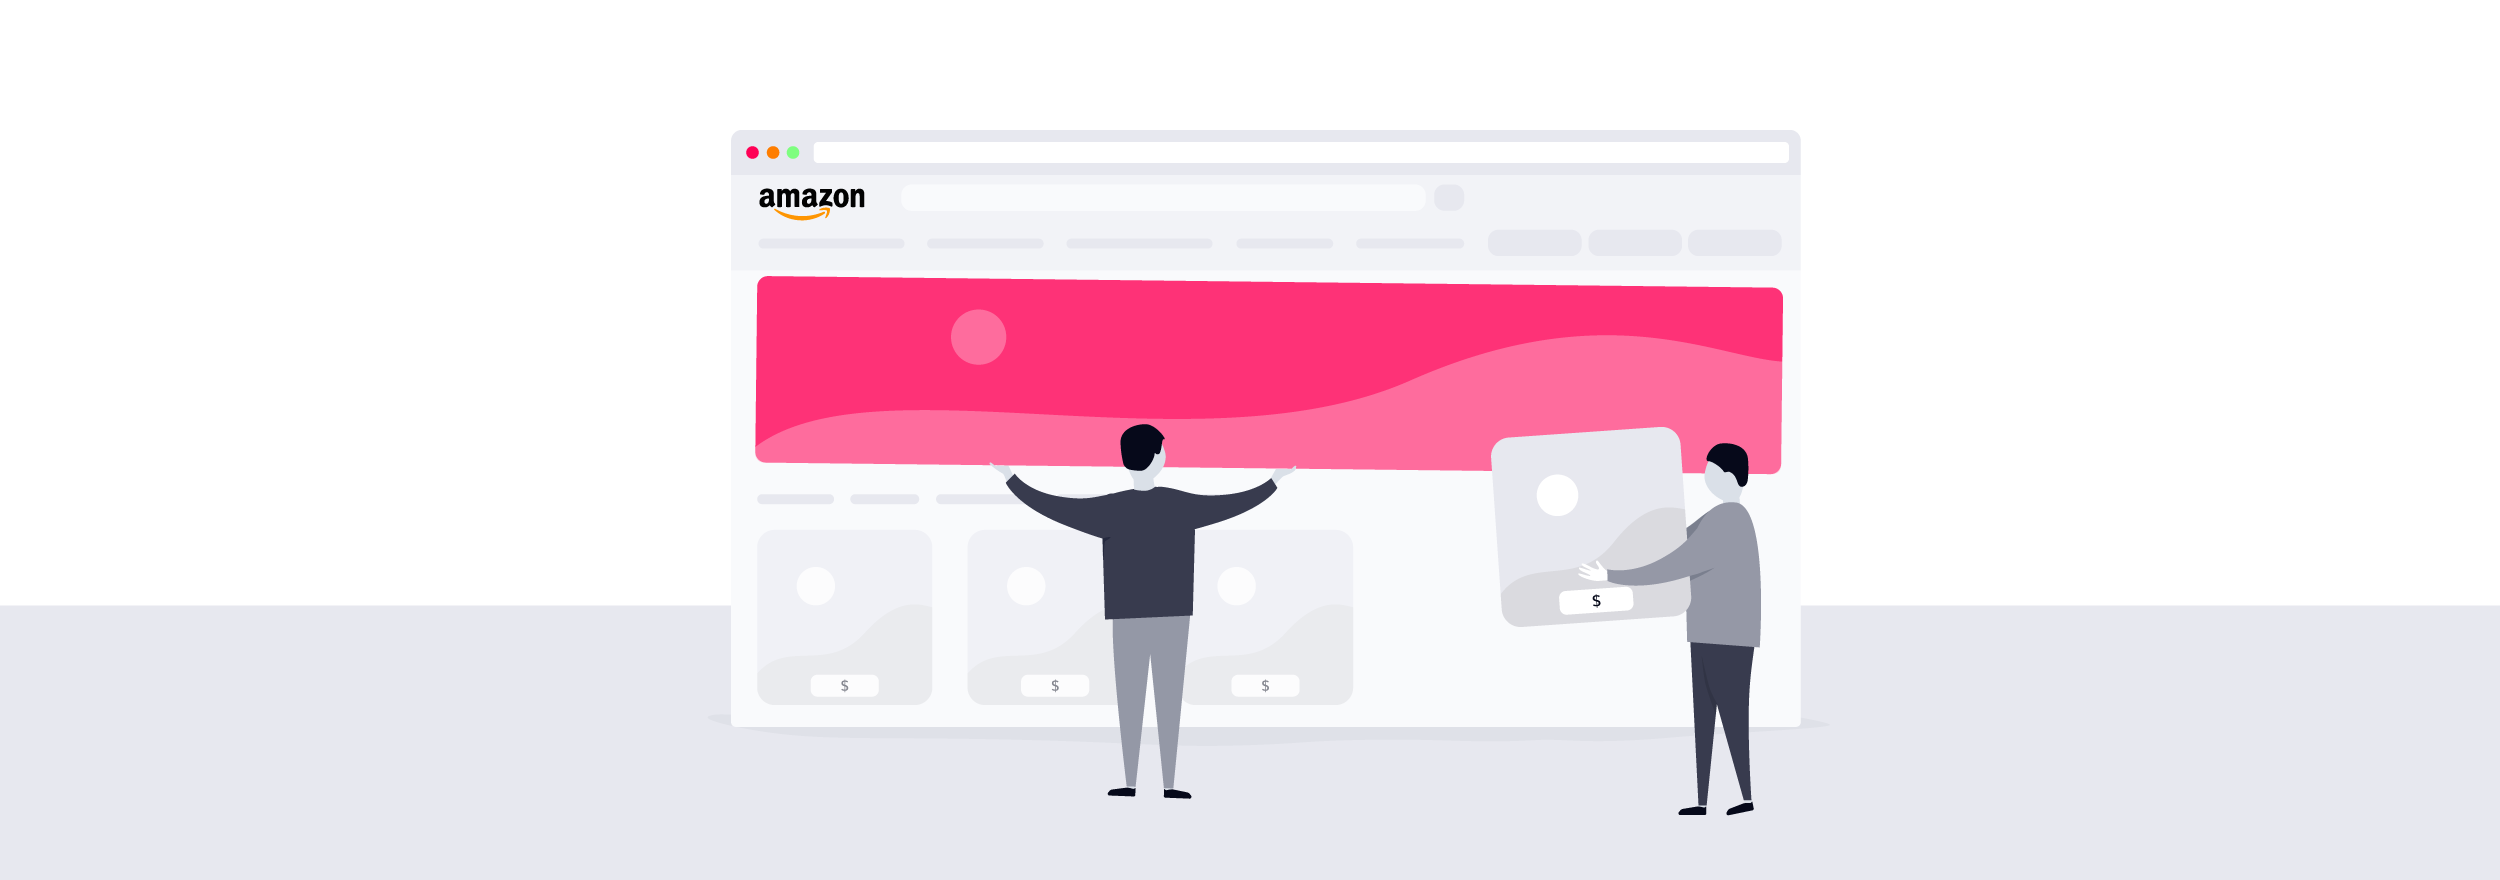 6 Amazon Listing Optimization Fundamentals For PPC